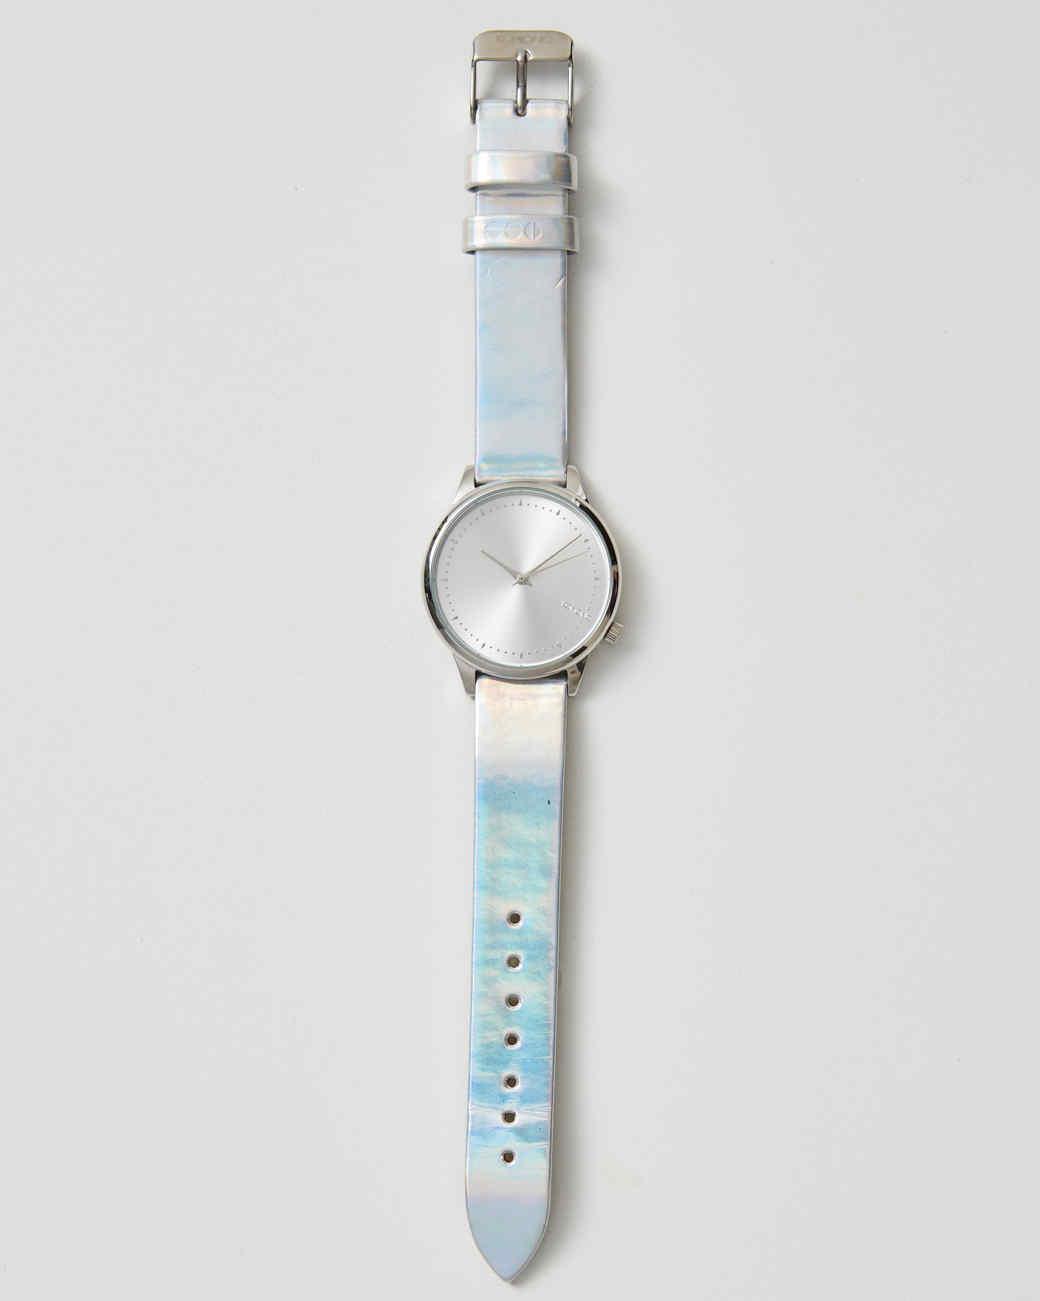 moma-silver-watch-141-d112494.jpg